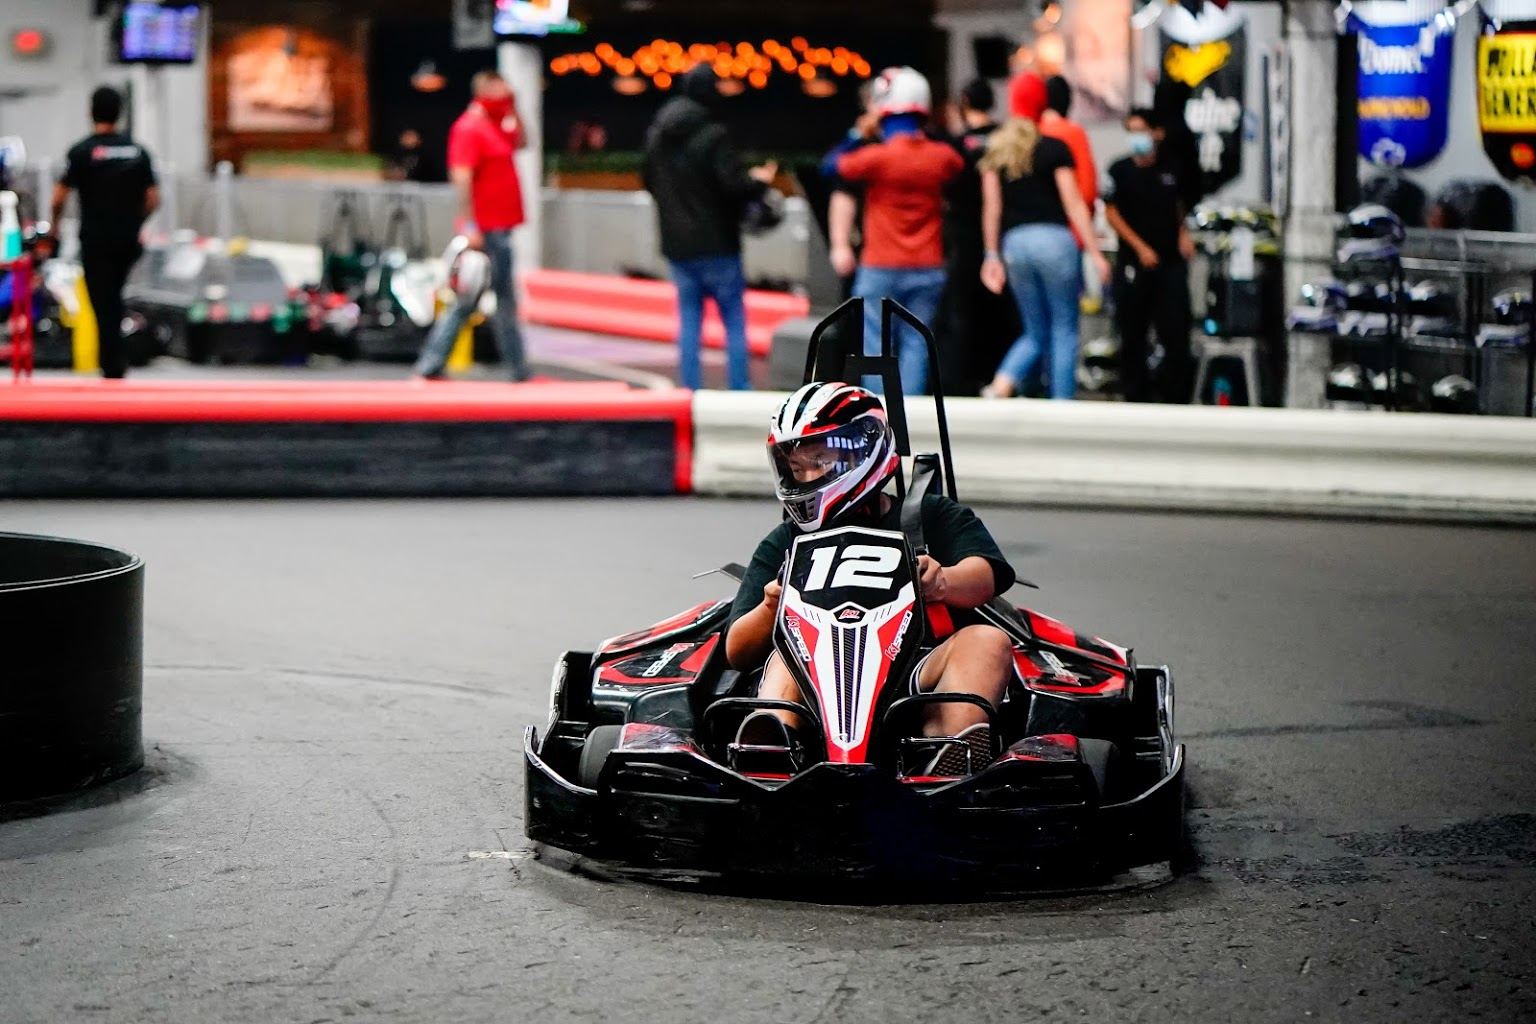 Junior Mini Grand Prix Birthday Party - Anaheim - Image 1